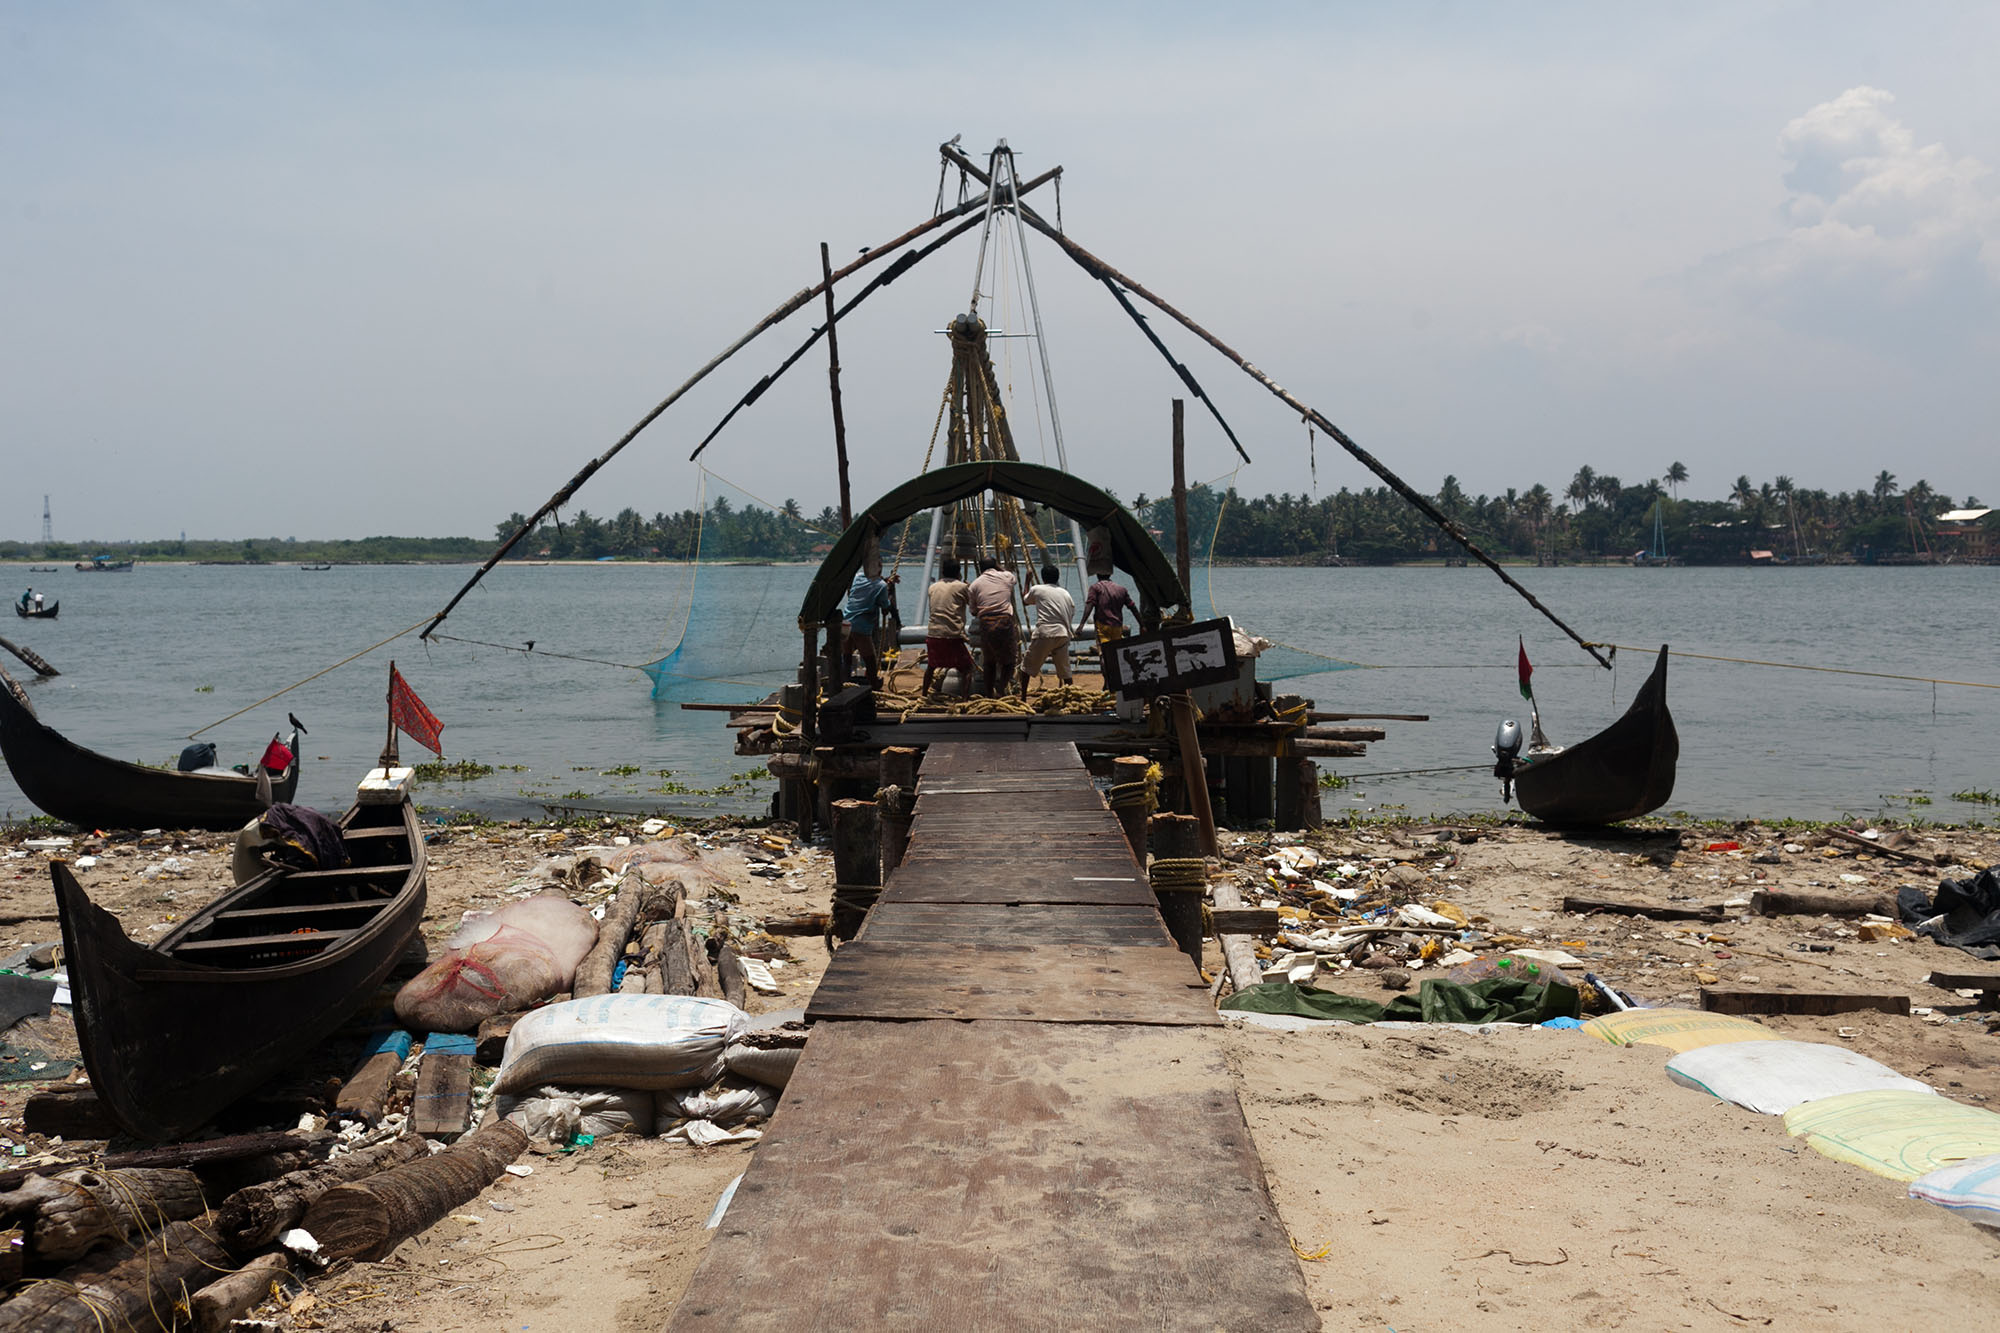 Kochi (Cochin), India